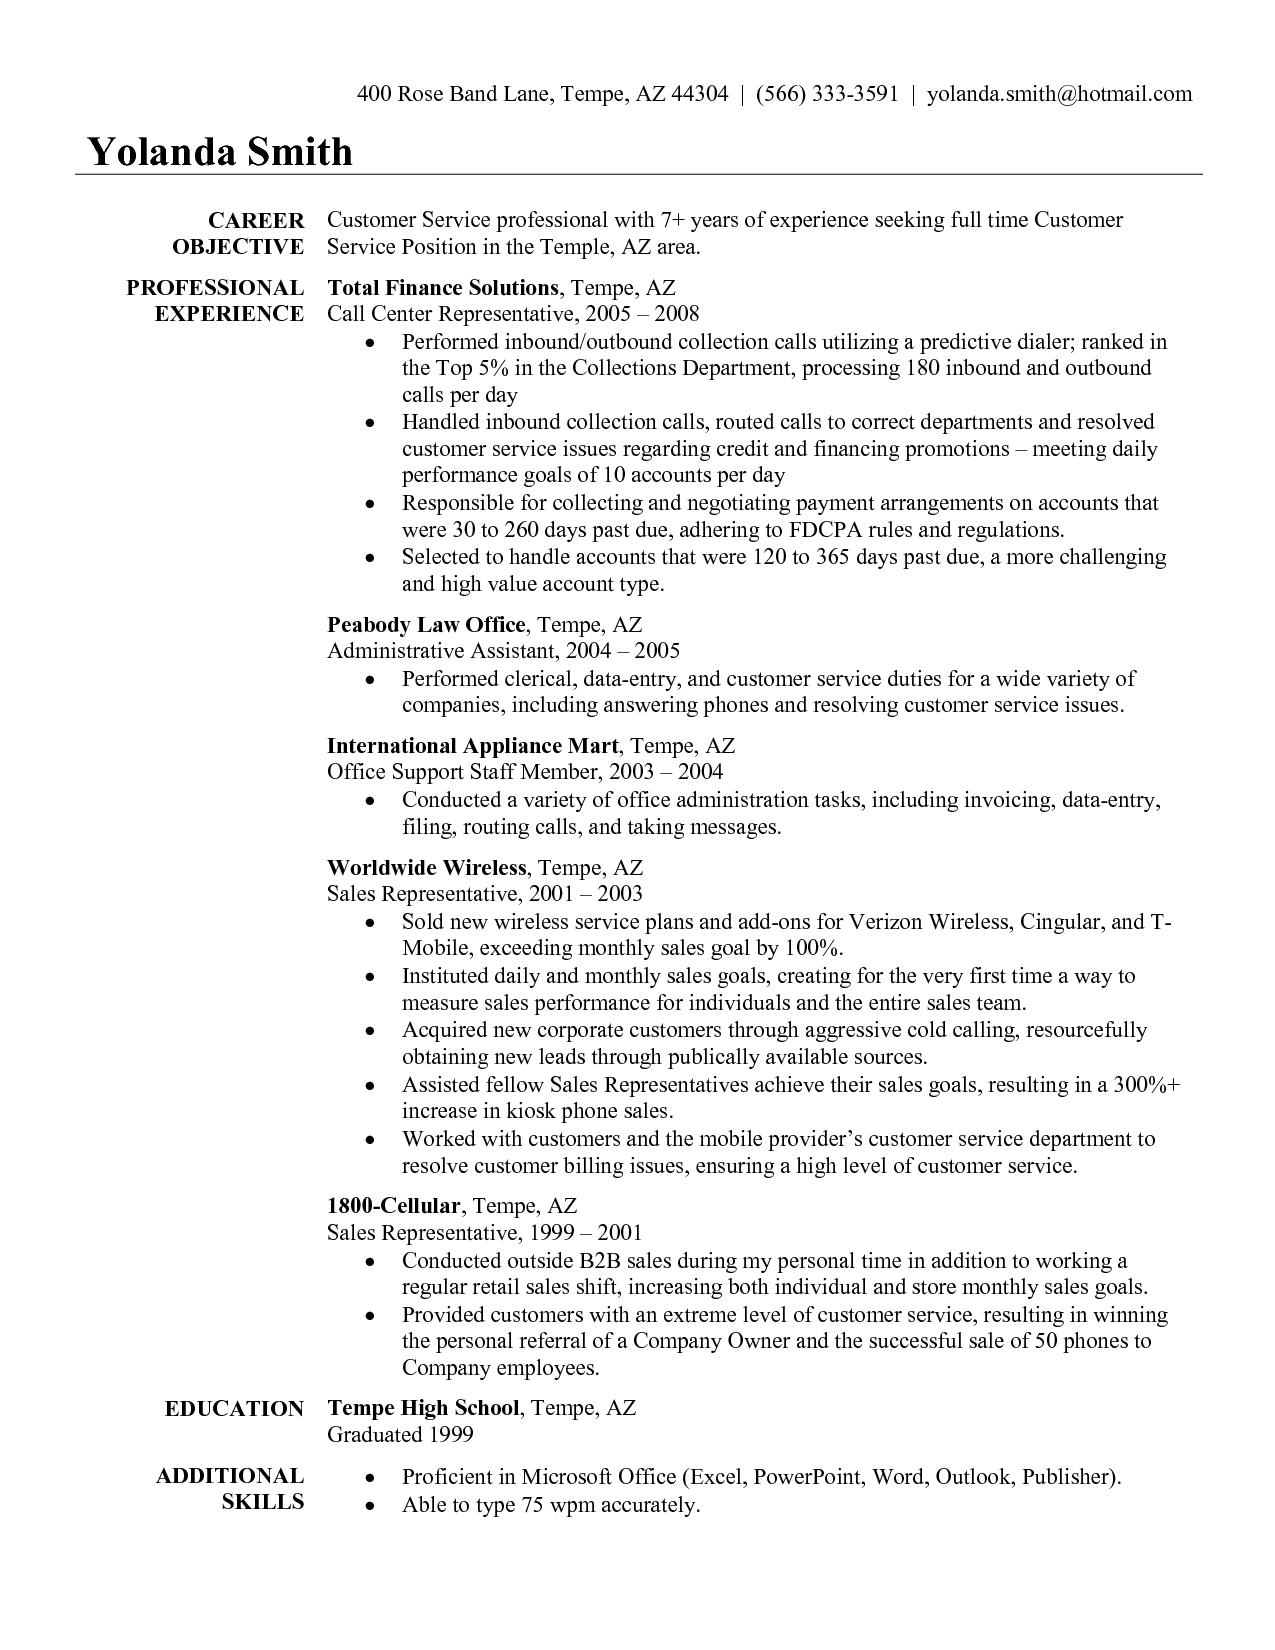 Traffic Customer Resume Examples,,customer service resume